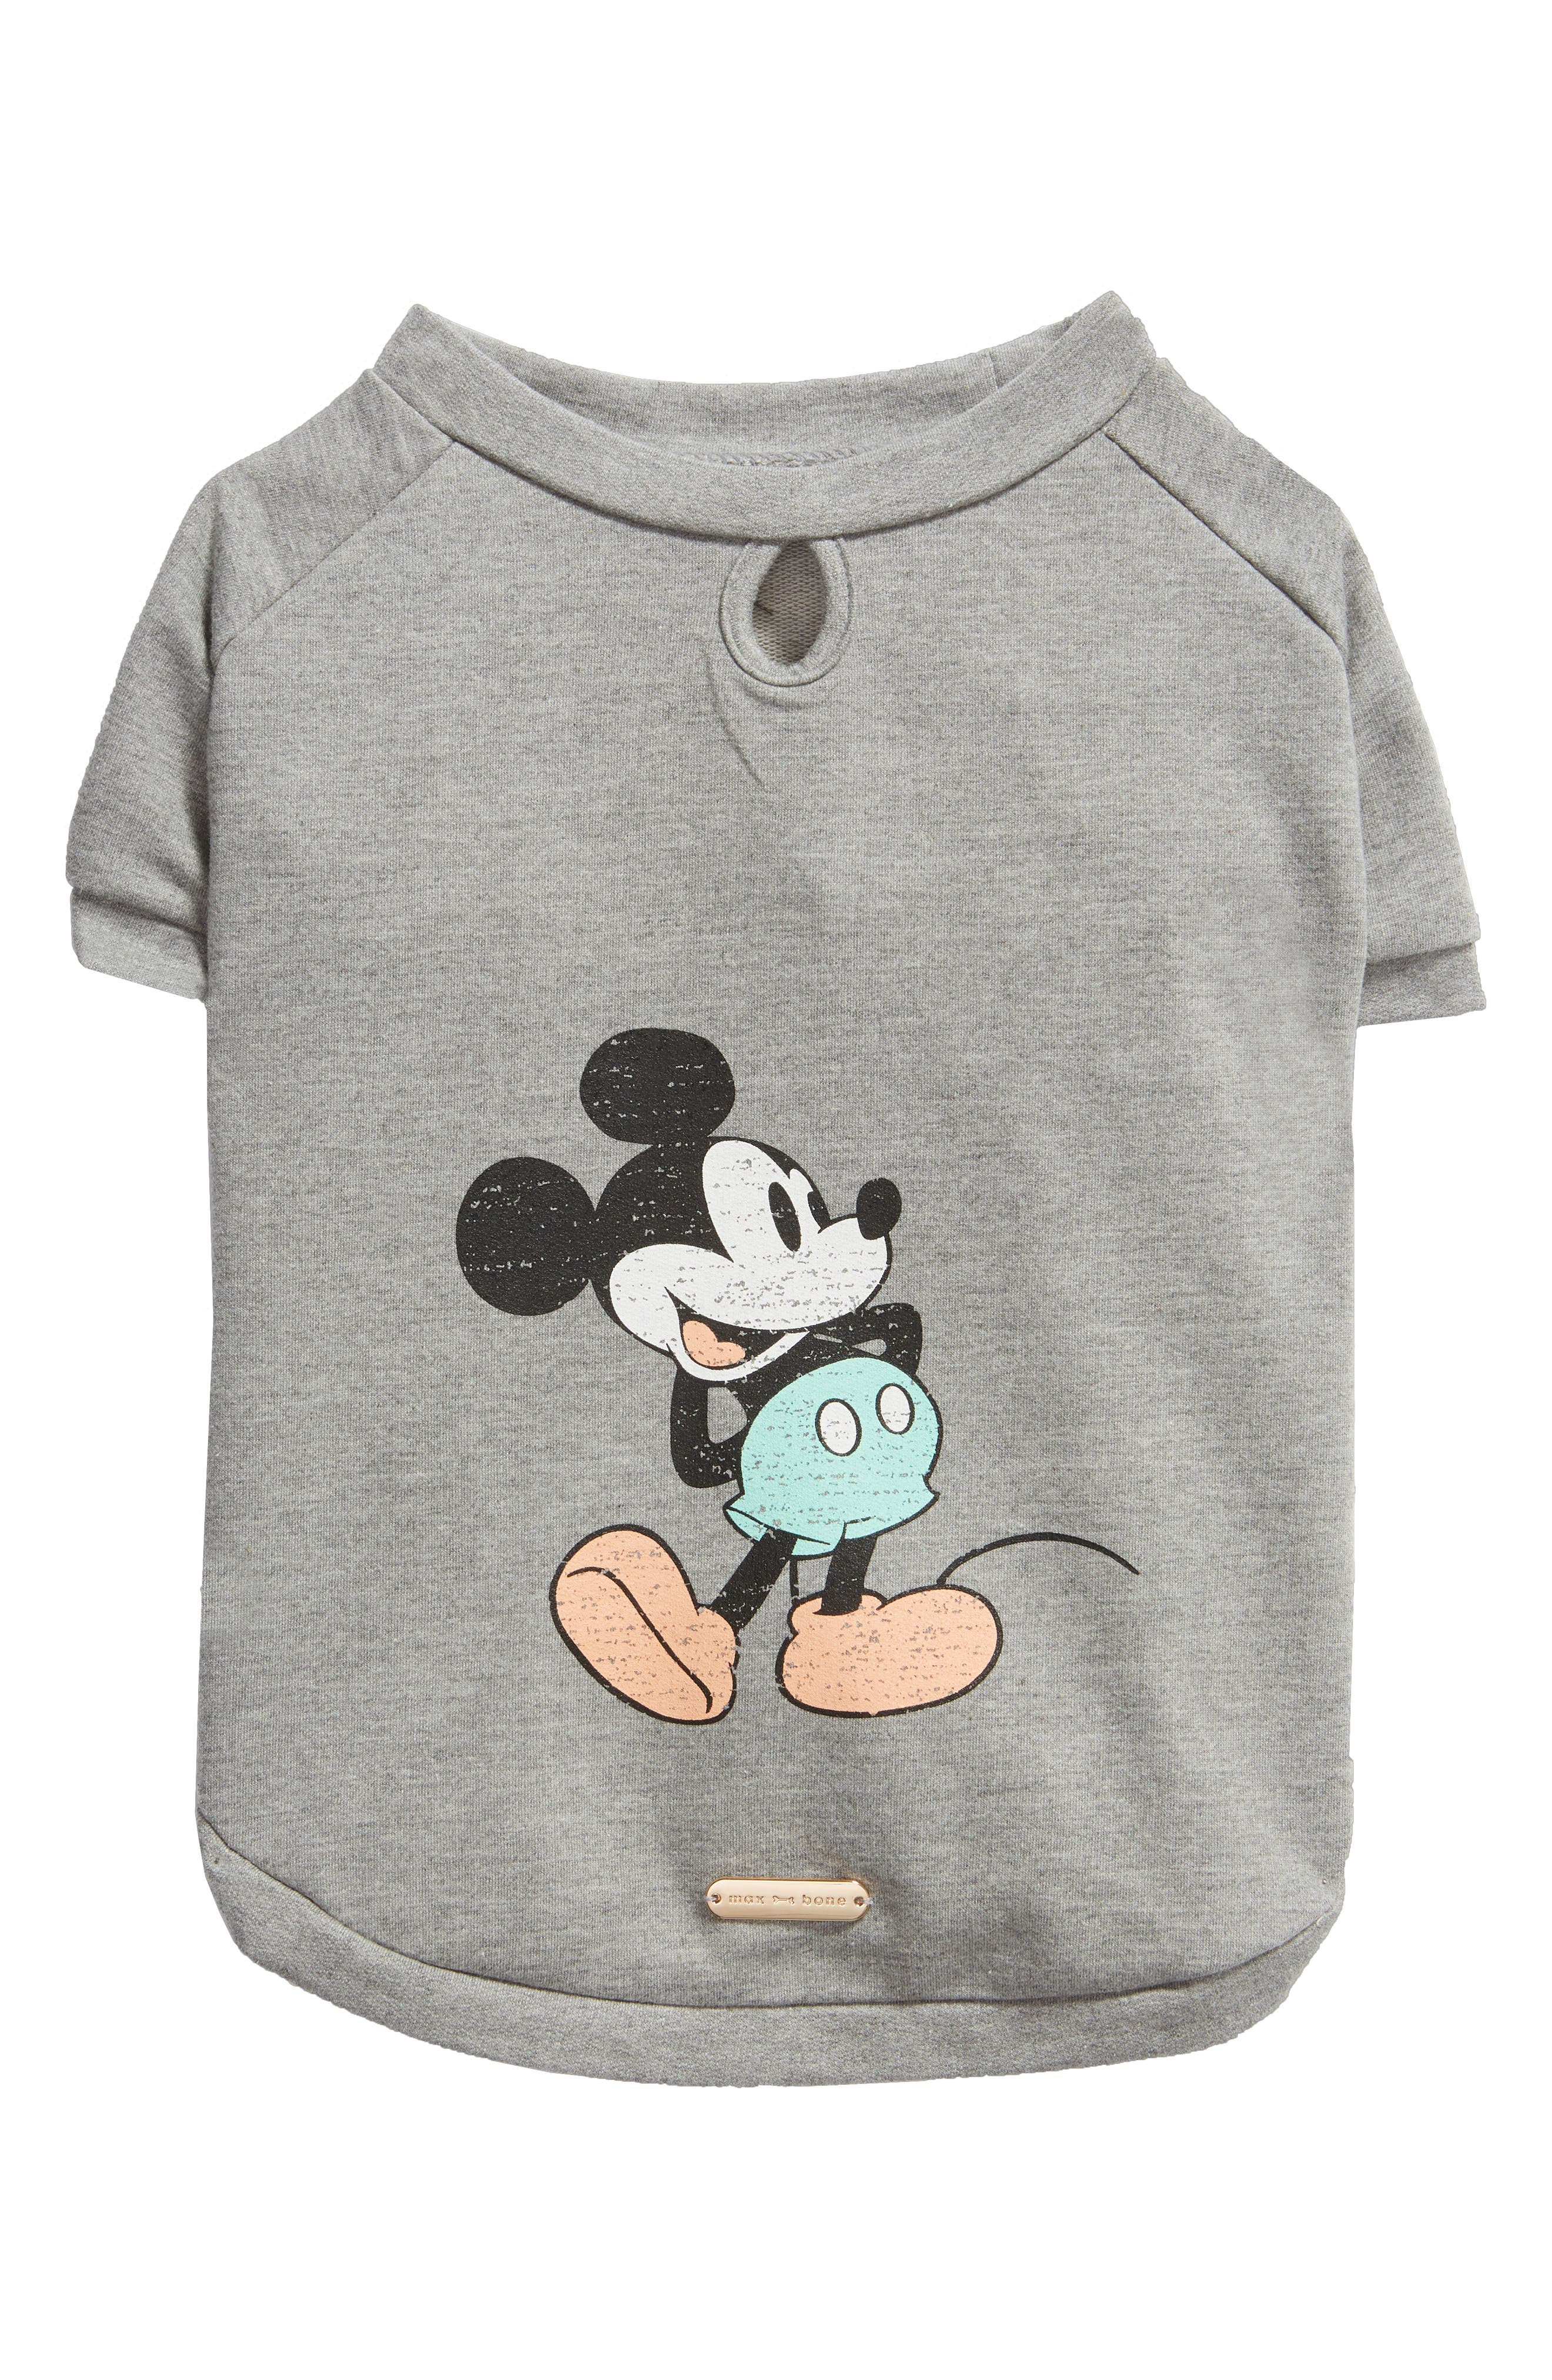 Max-Bone Classic Mickey Mouse Dog Sweater, Grey